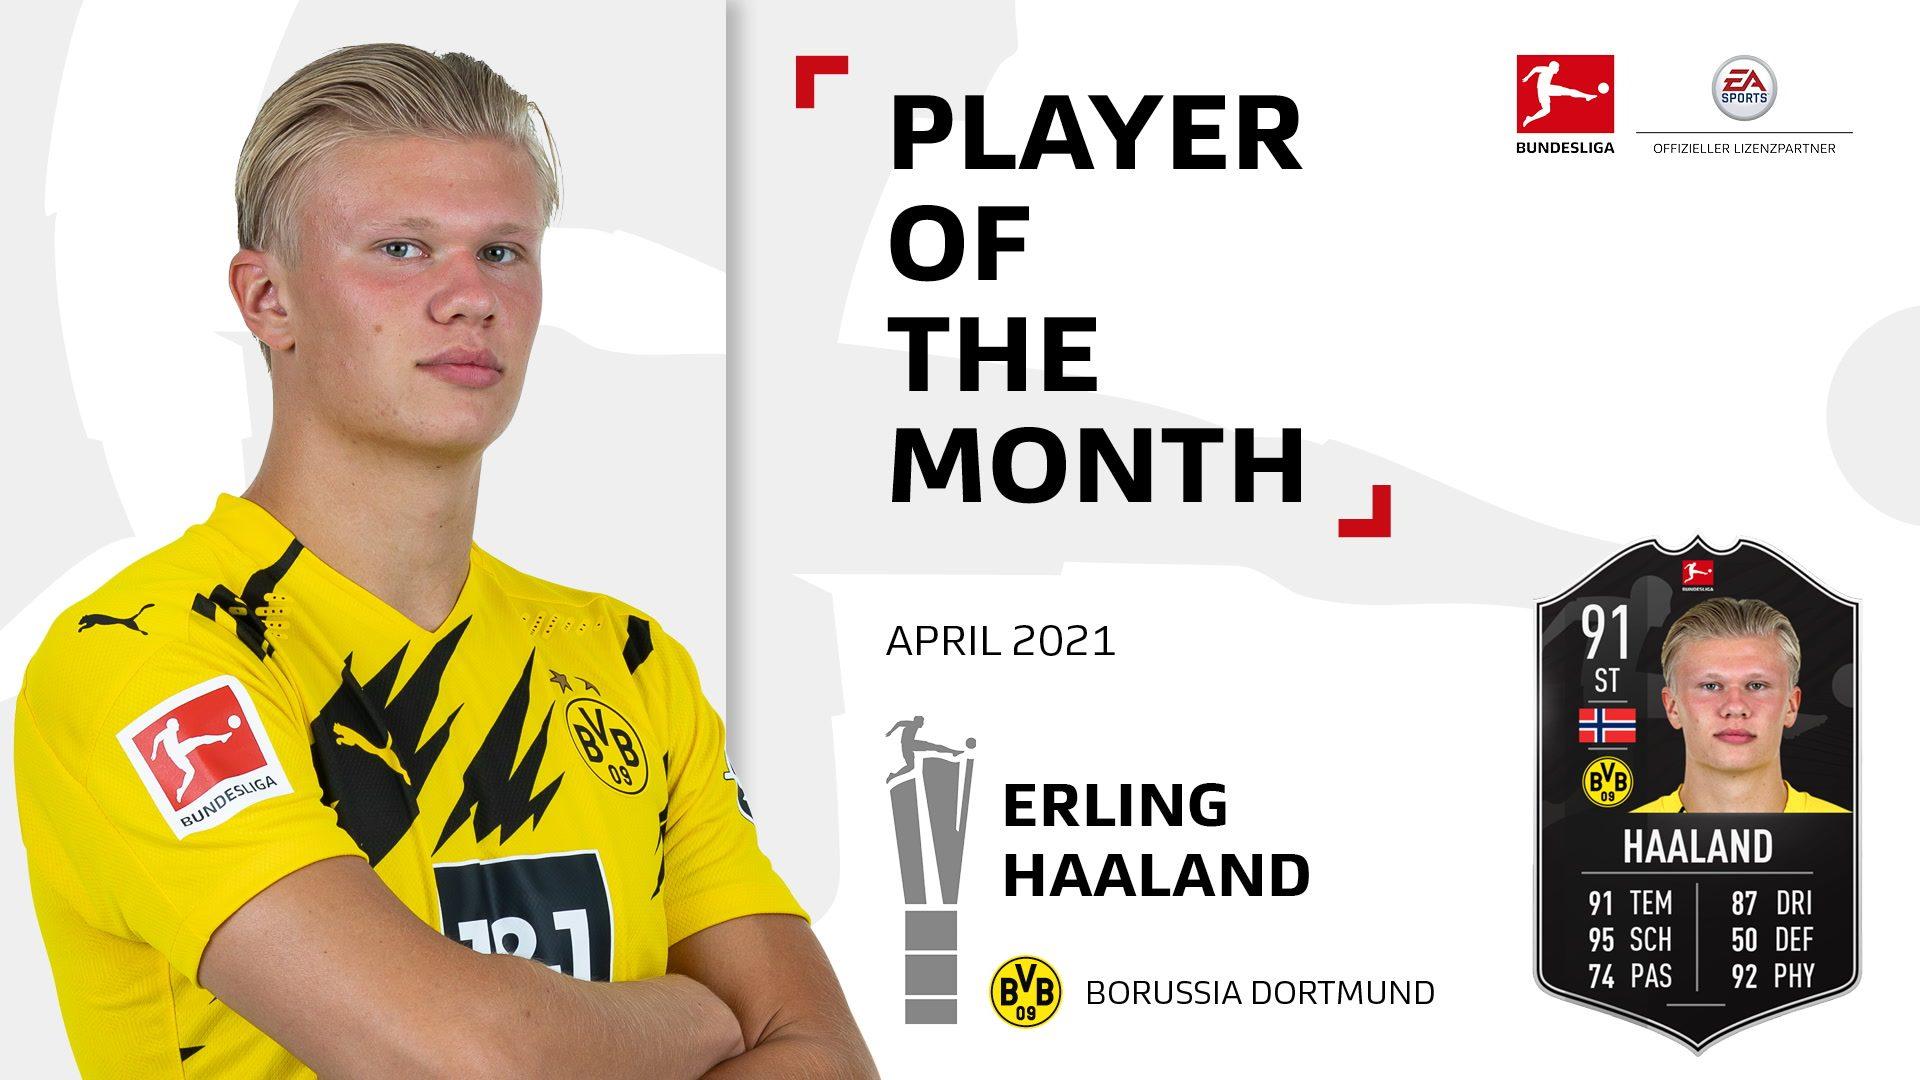 Erling Haaland ist der Spieler des Monats April